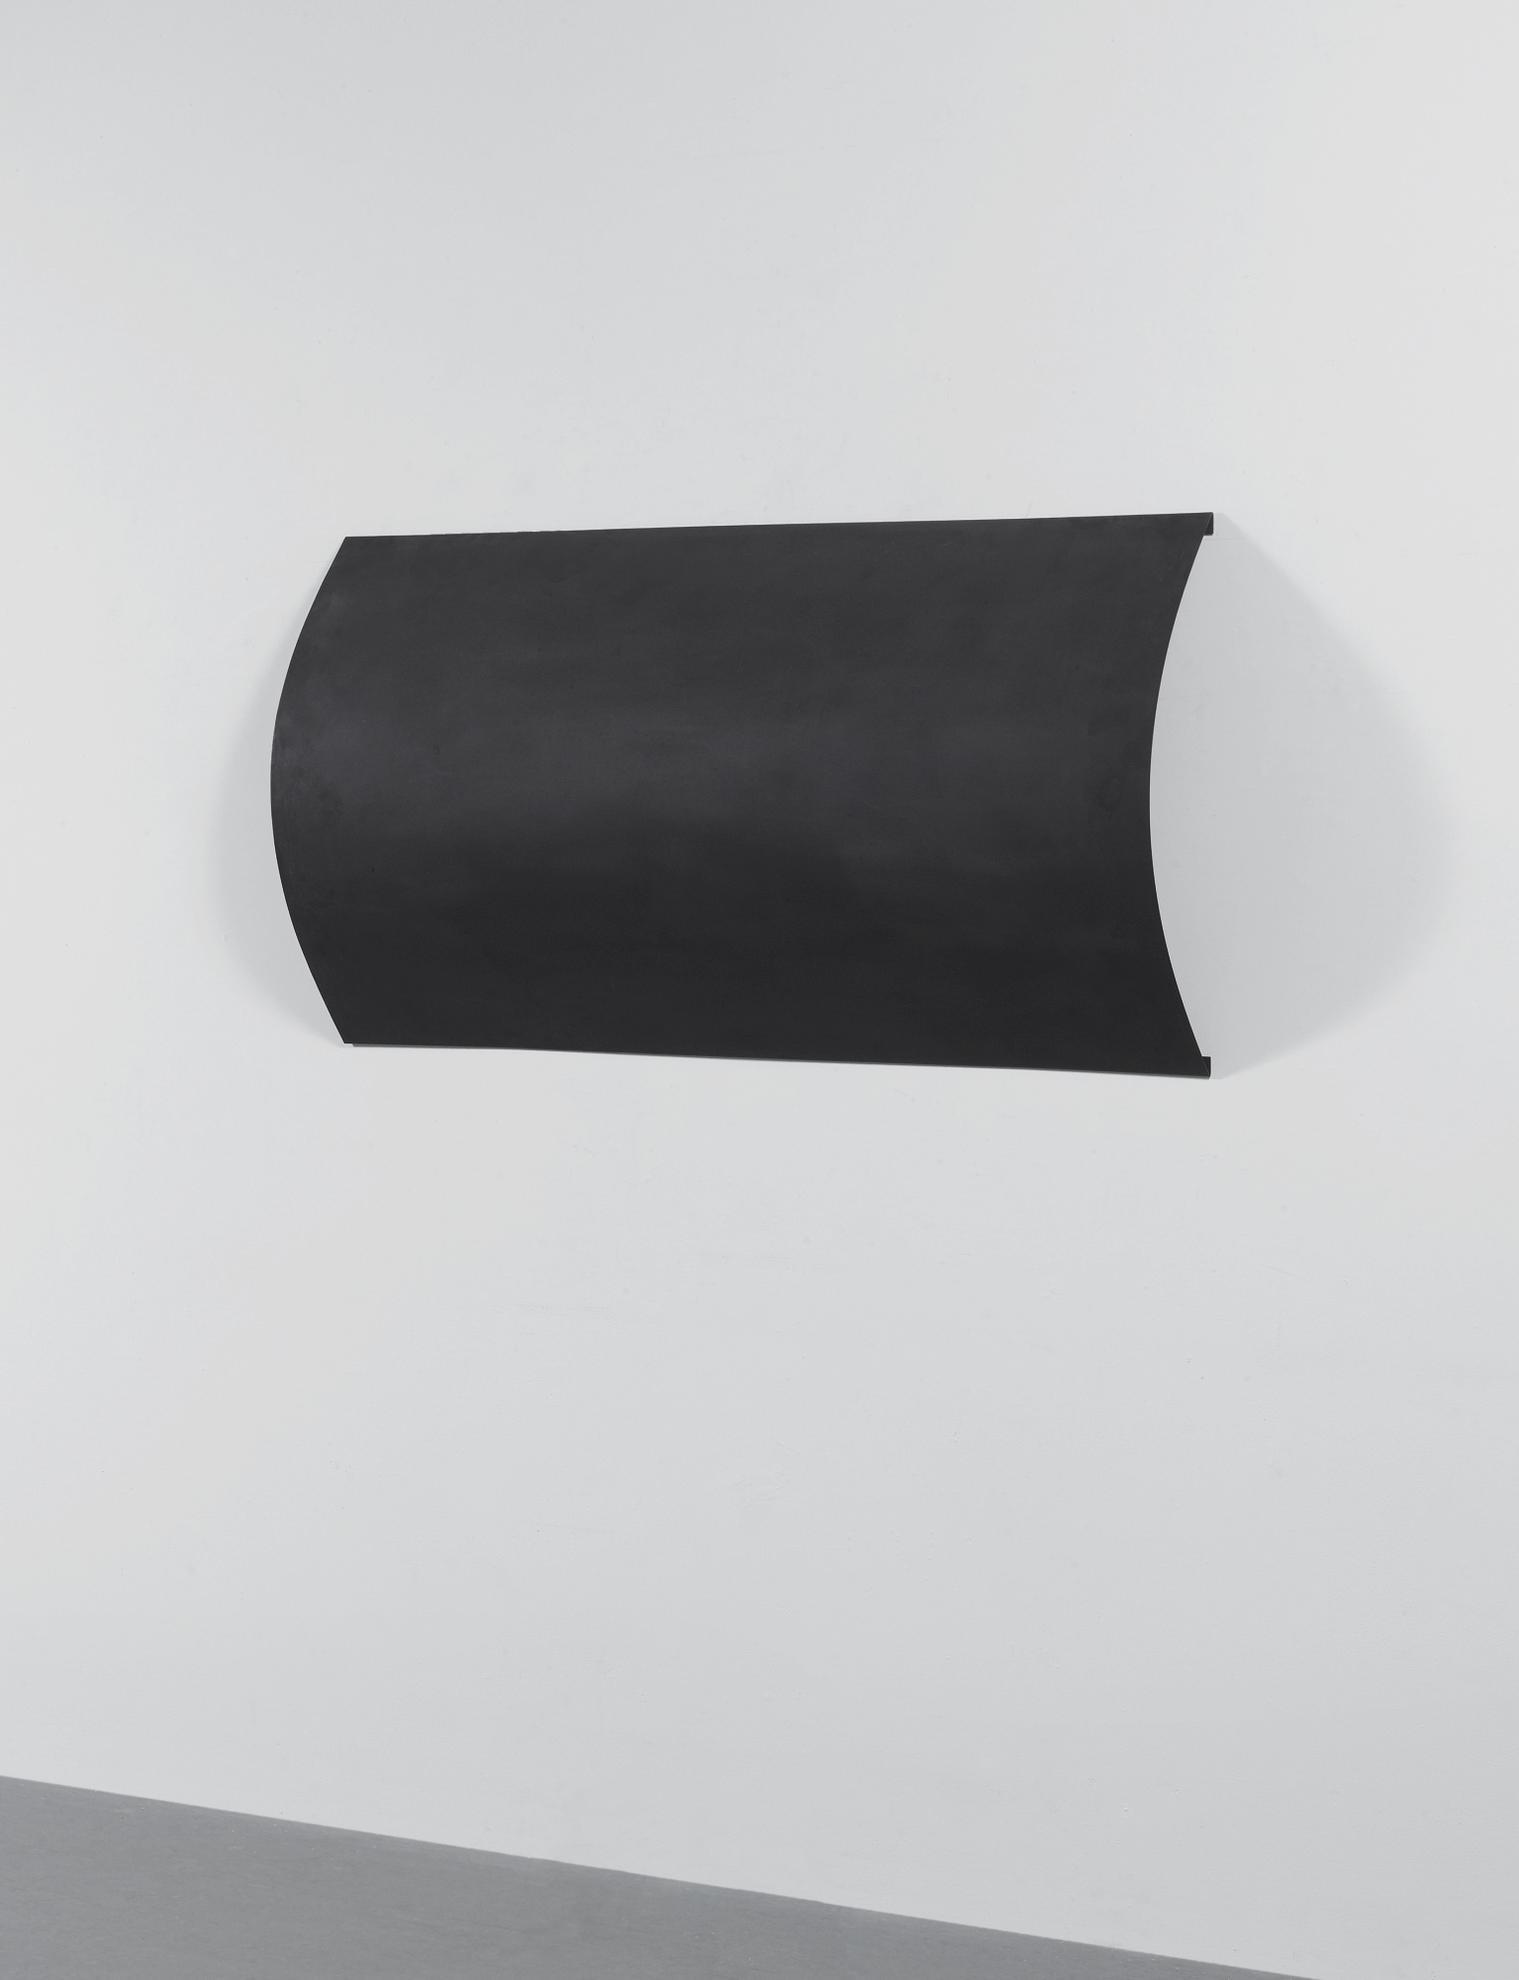 Francesco Lo Savio-Untitled-1959